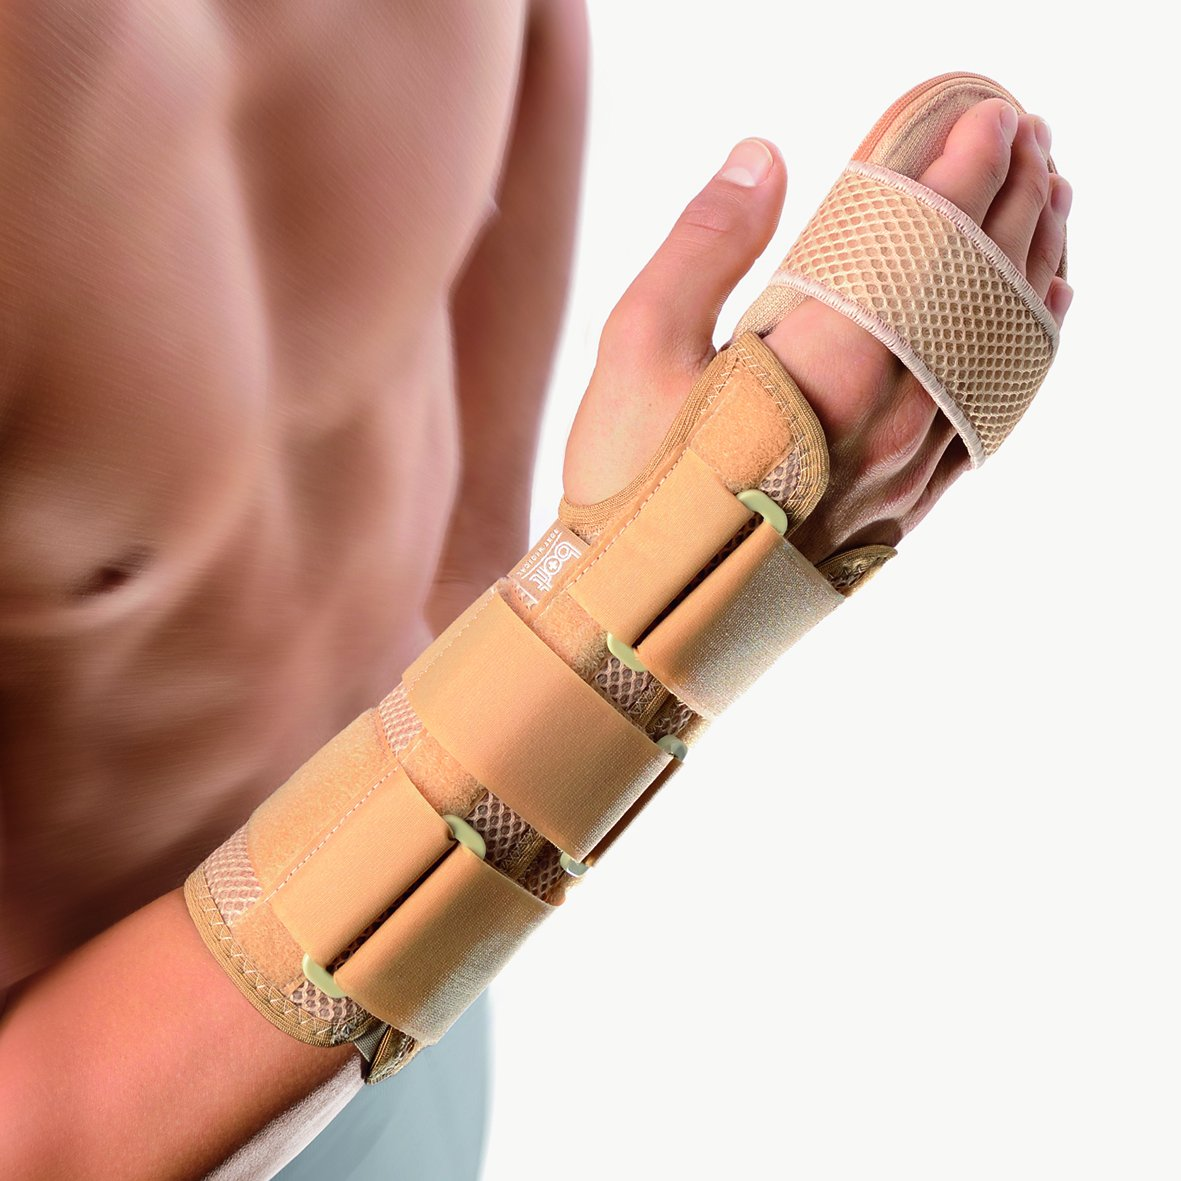 Bort Soft Hand Splint Brace Finger Support Carpal Tunnel Night Wrist Splint Immobilizer Finger Wrist Fracture Tendinitis Sprain Medical Grade Made in Germany (Beige, Medium, Right 6.7'' - 7.5'' inches)